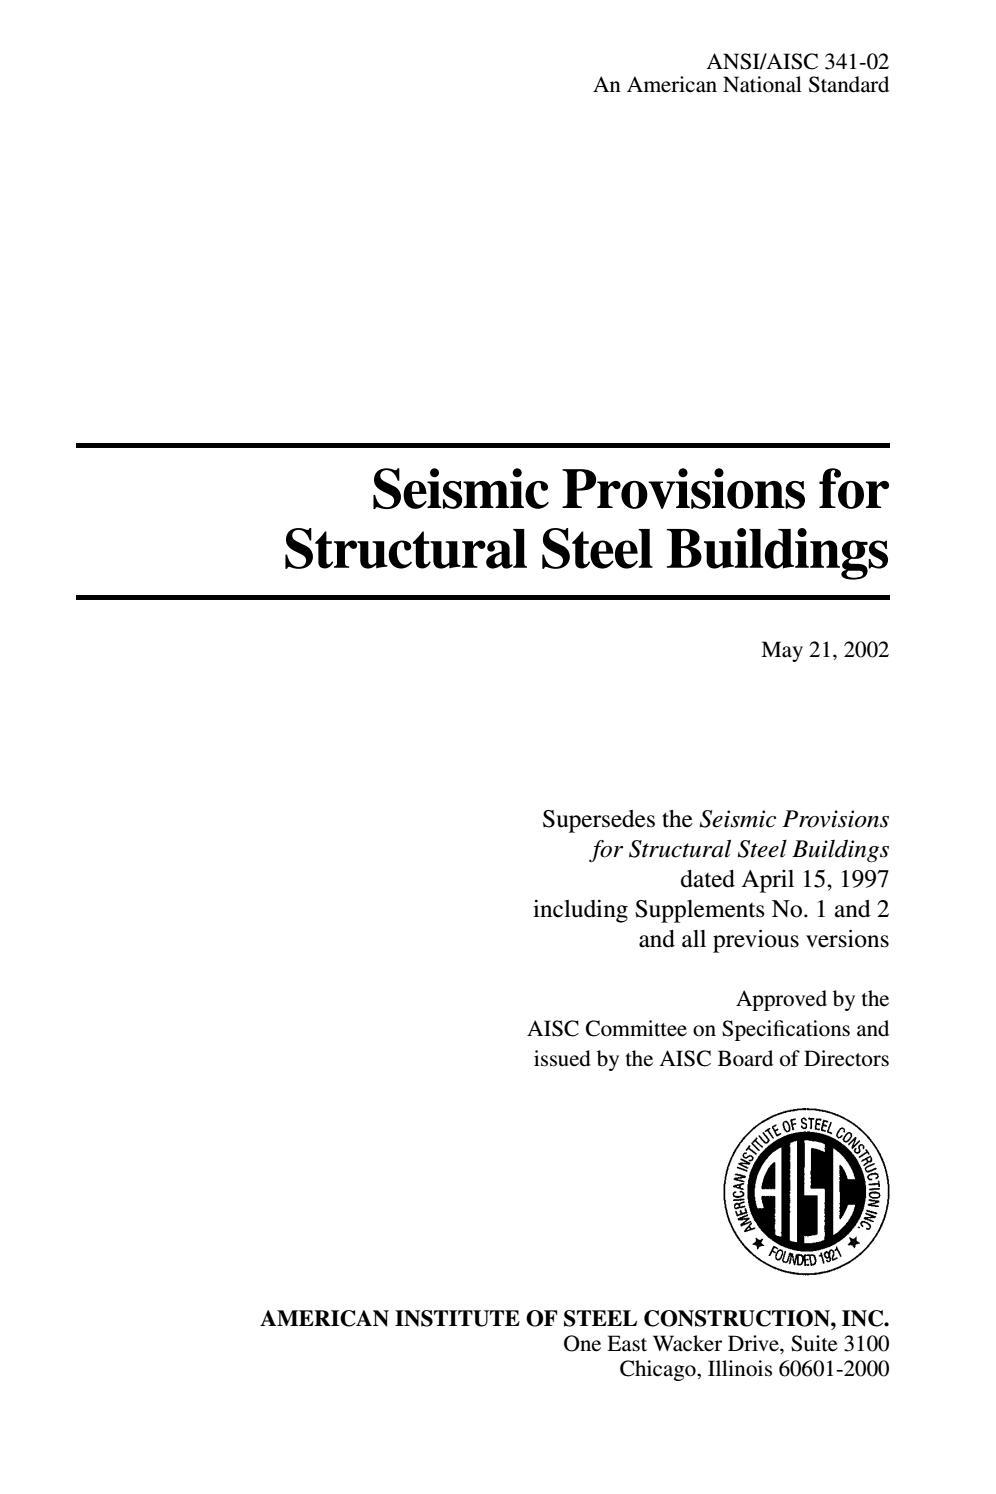 Seismic Provisions ANSI/AISC 341-02 PART. 1 by Pedro Antonio Jiménez  Sánchez - issuu